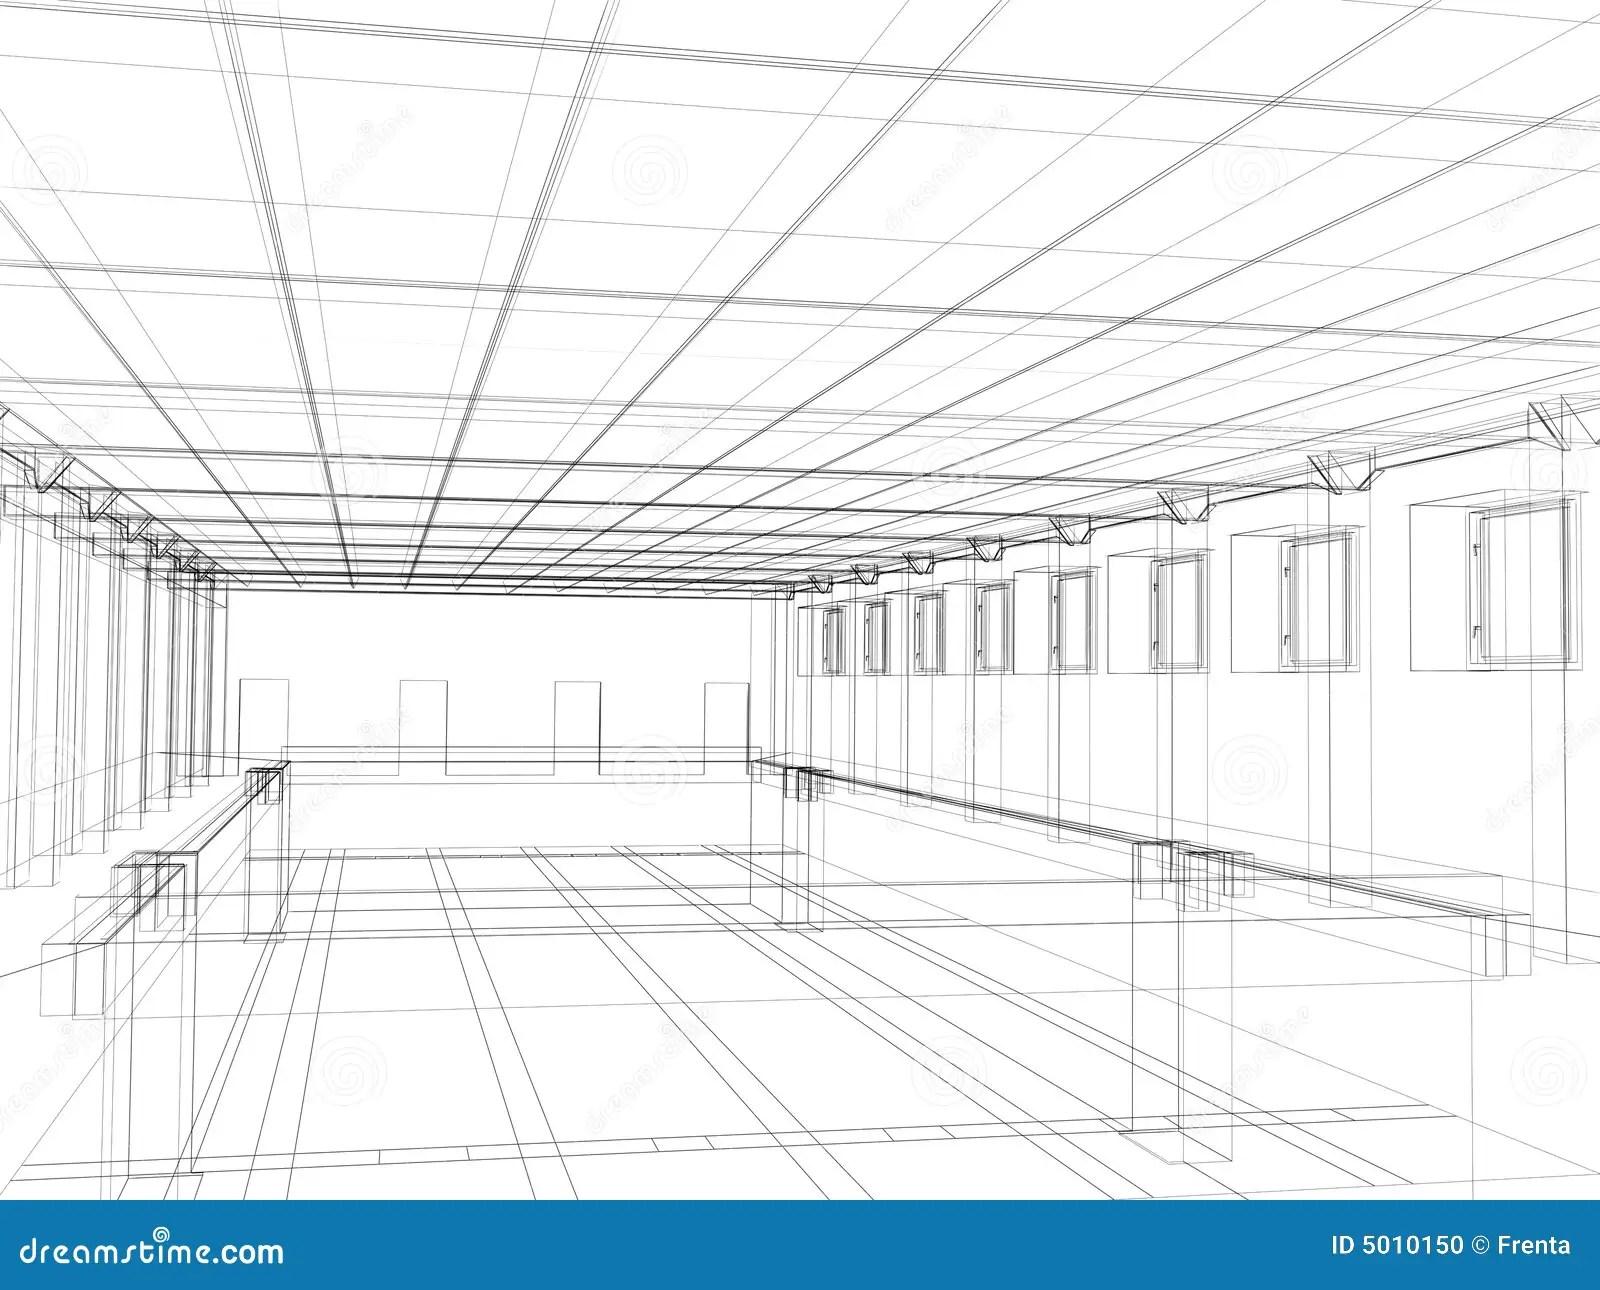 3d Sketch Of An Interior Public Building Stock Photo